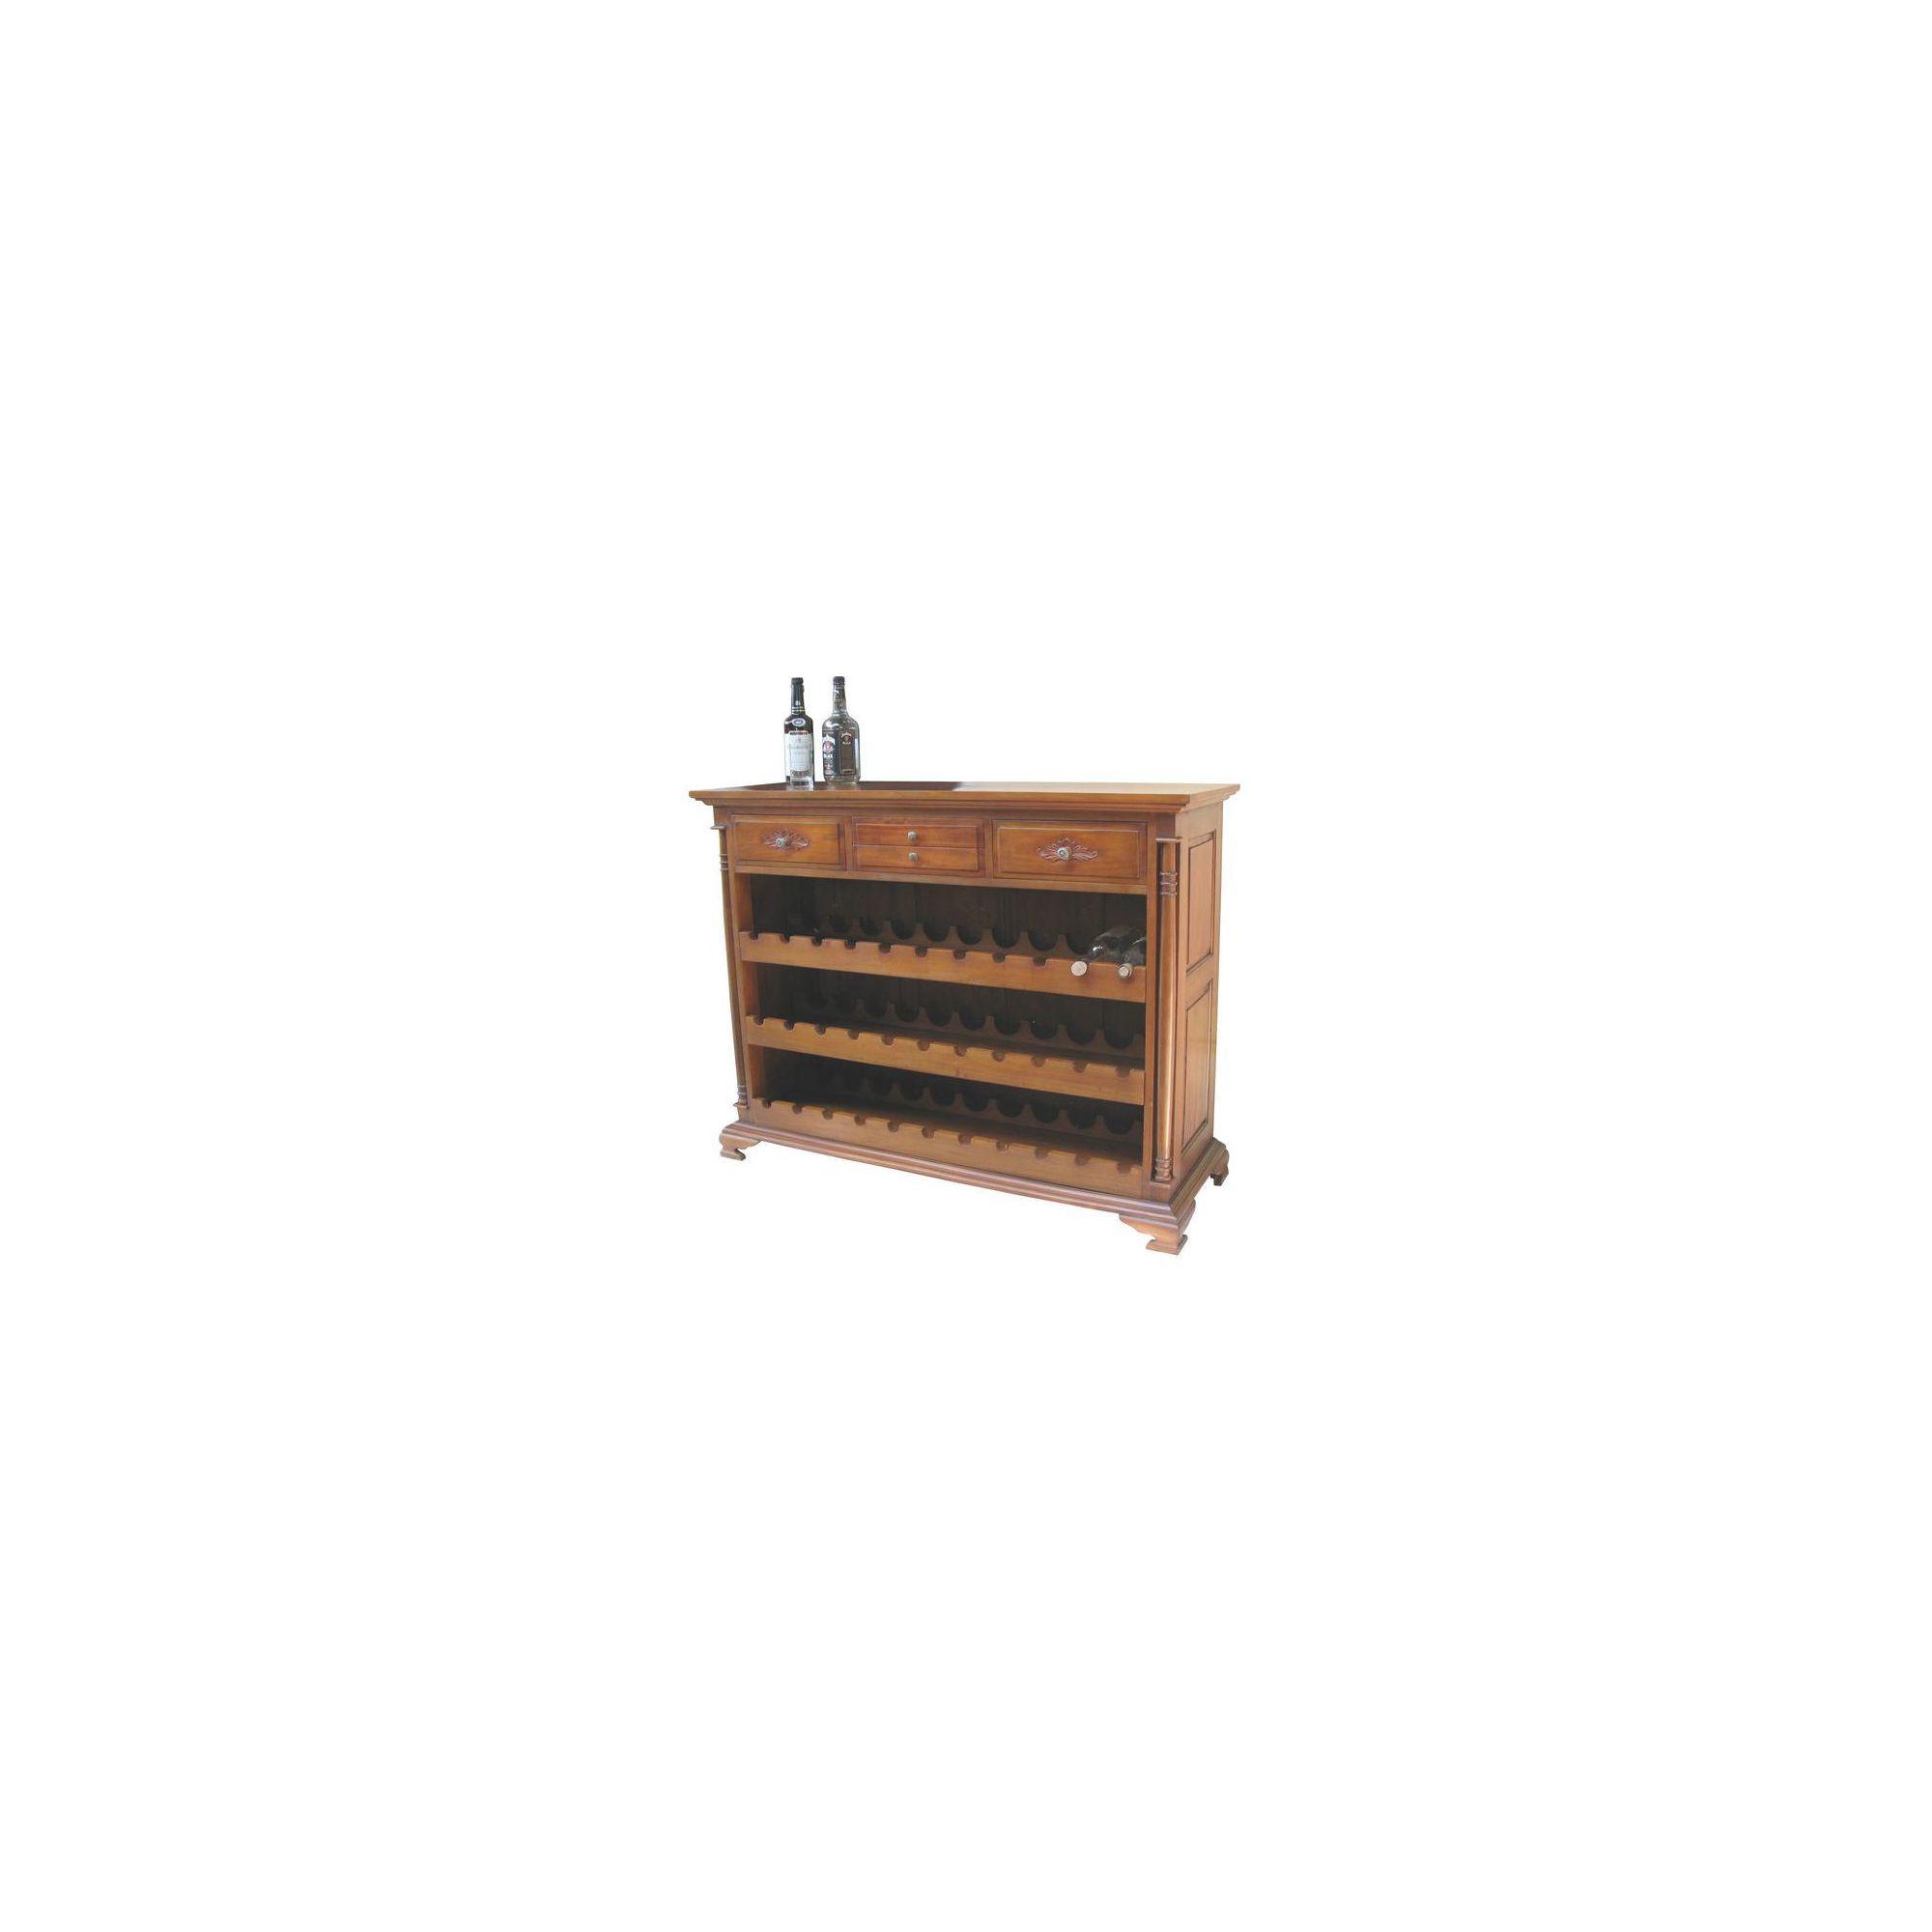 Lock stock and barrel Mahogany 4 Drawer Wine Rack in Mahogany at Tesco Direct